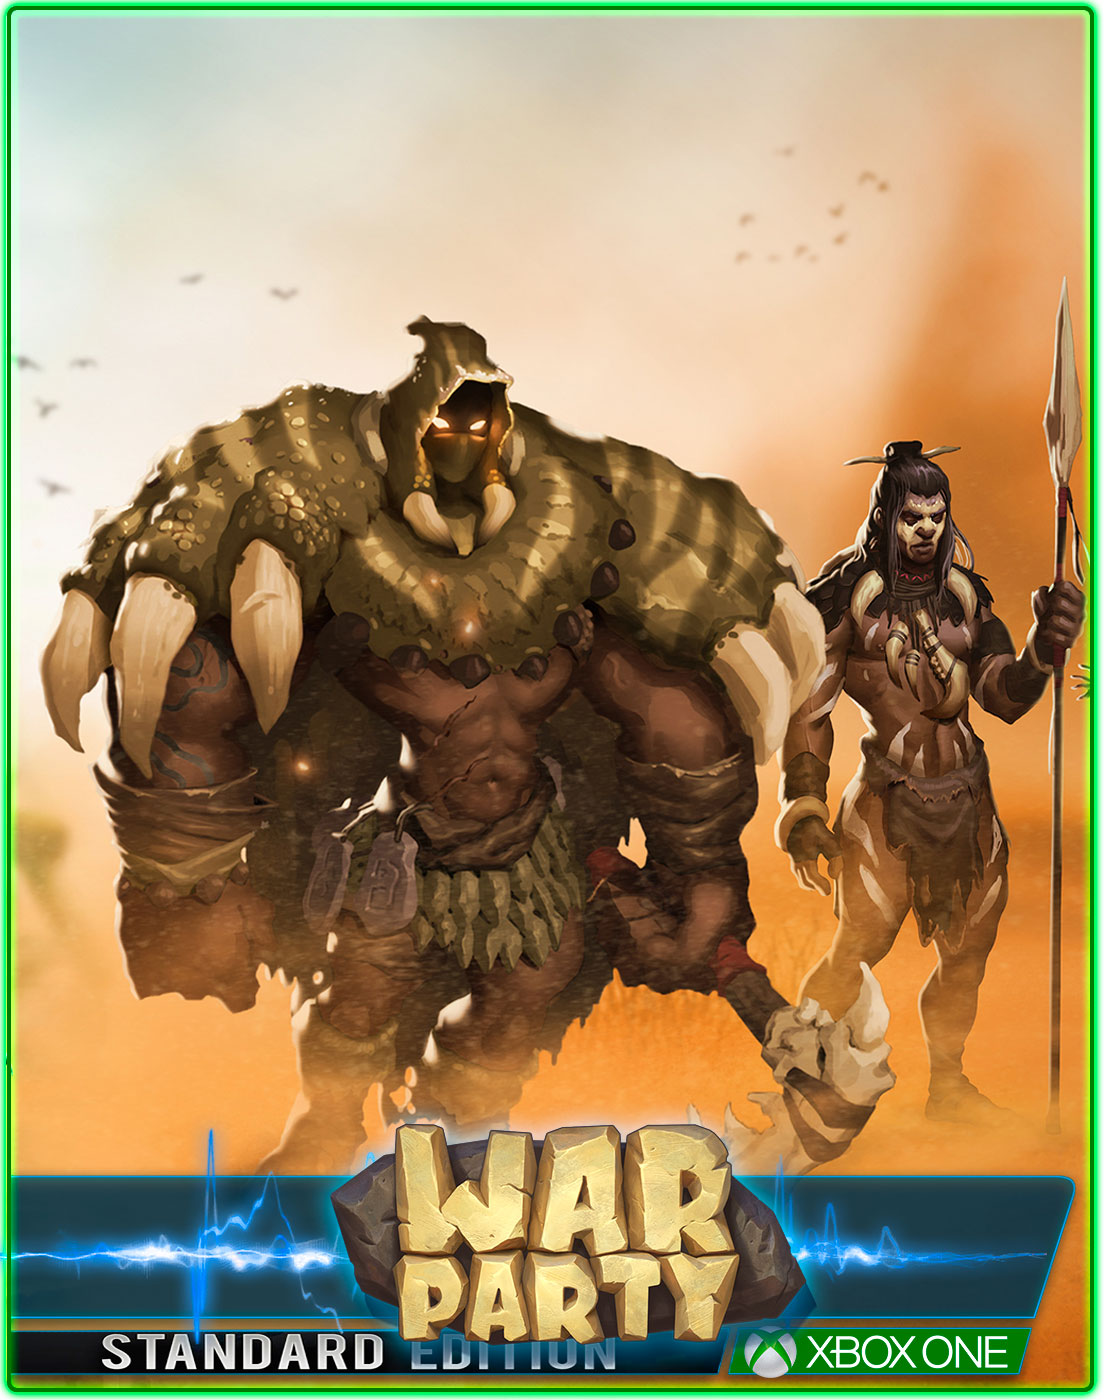 Warparty(XBOX ONE) 2019